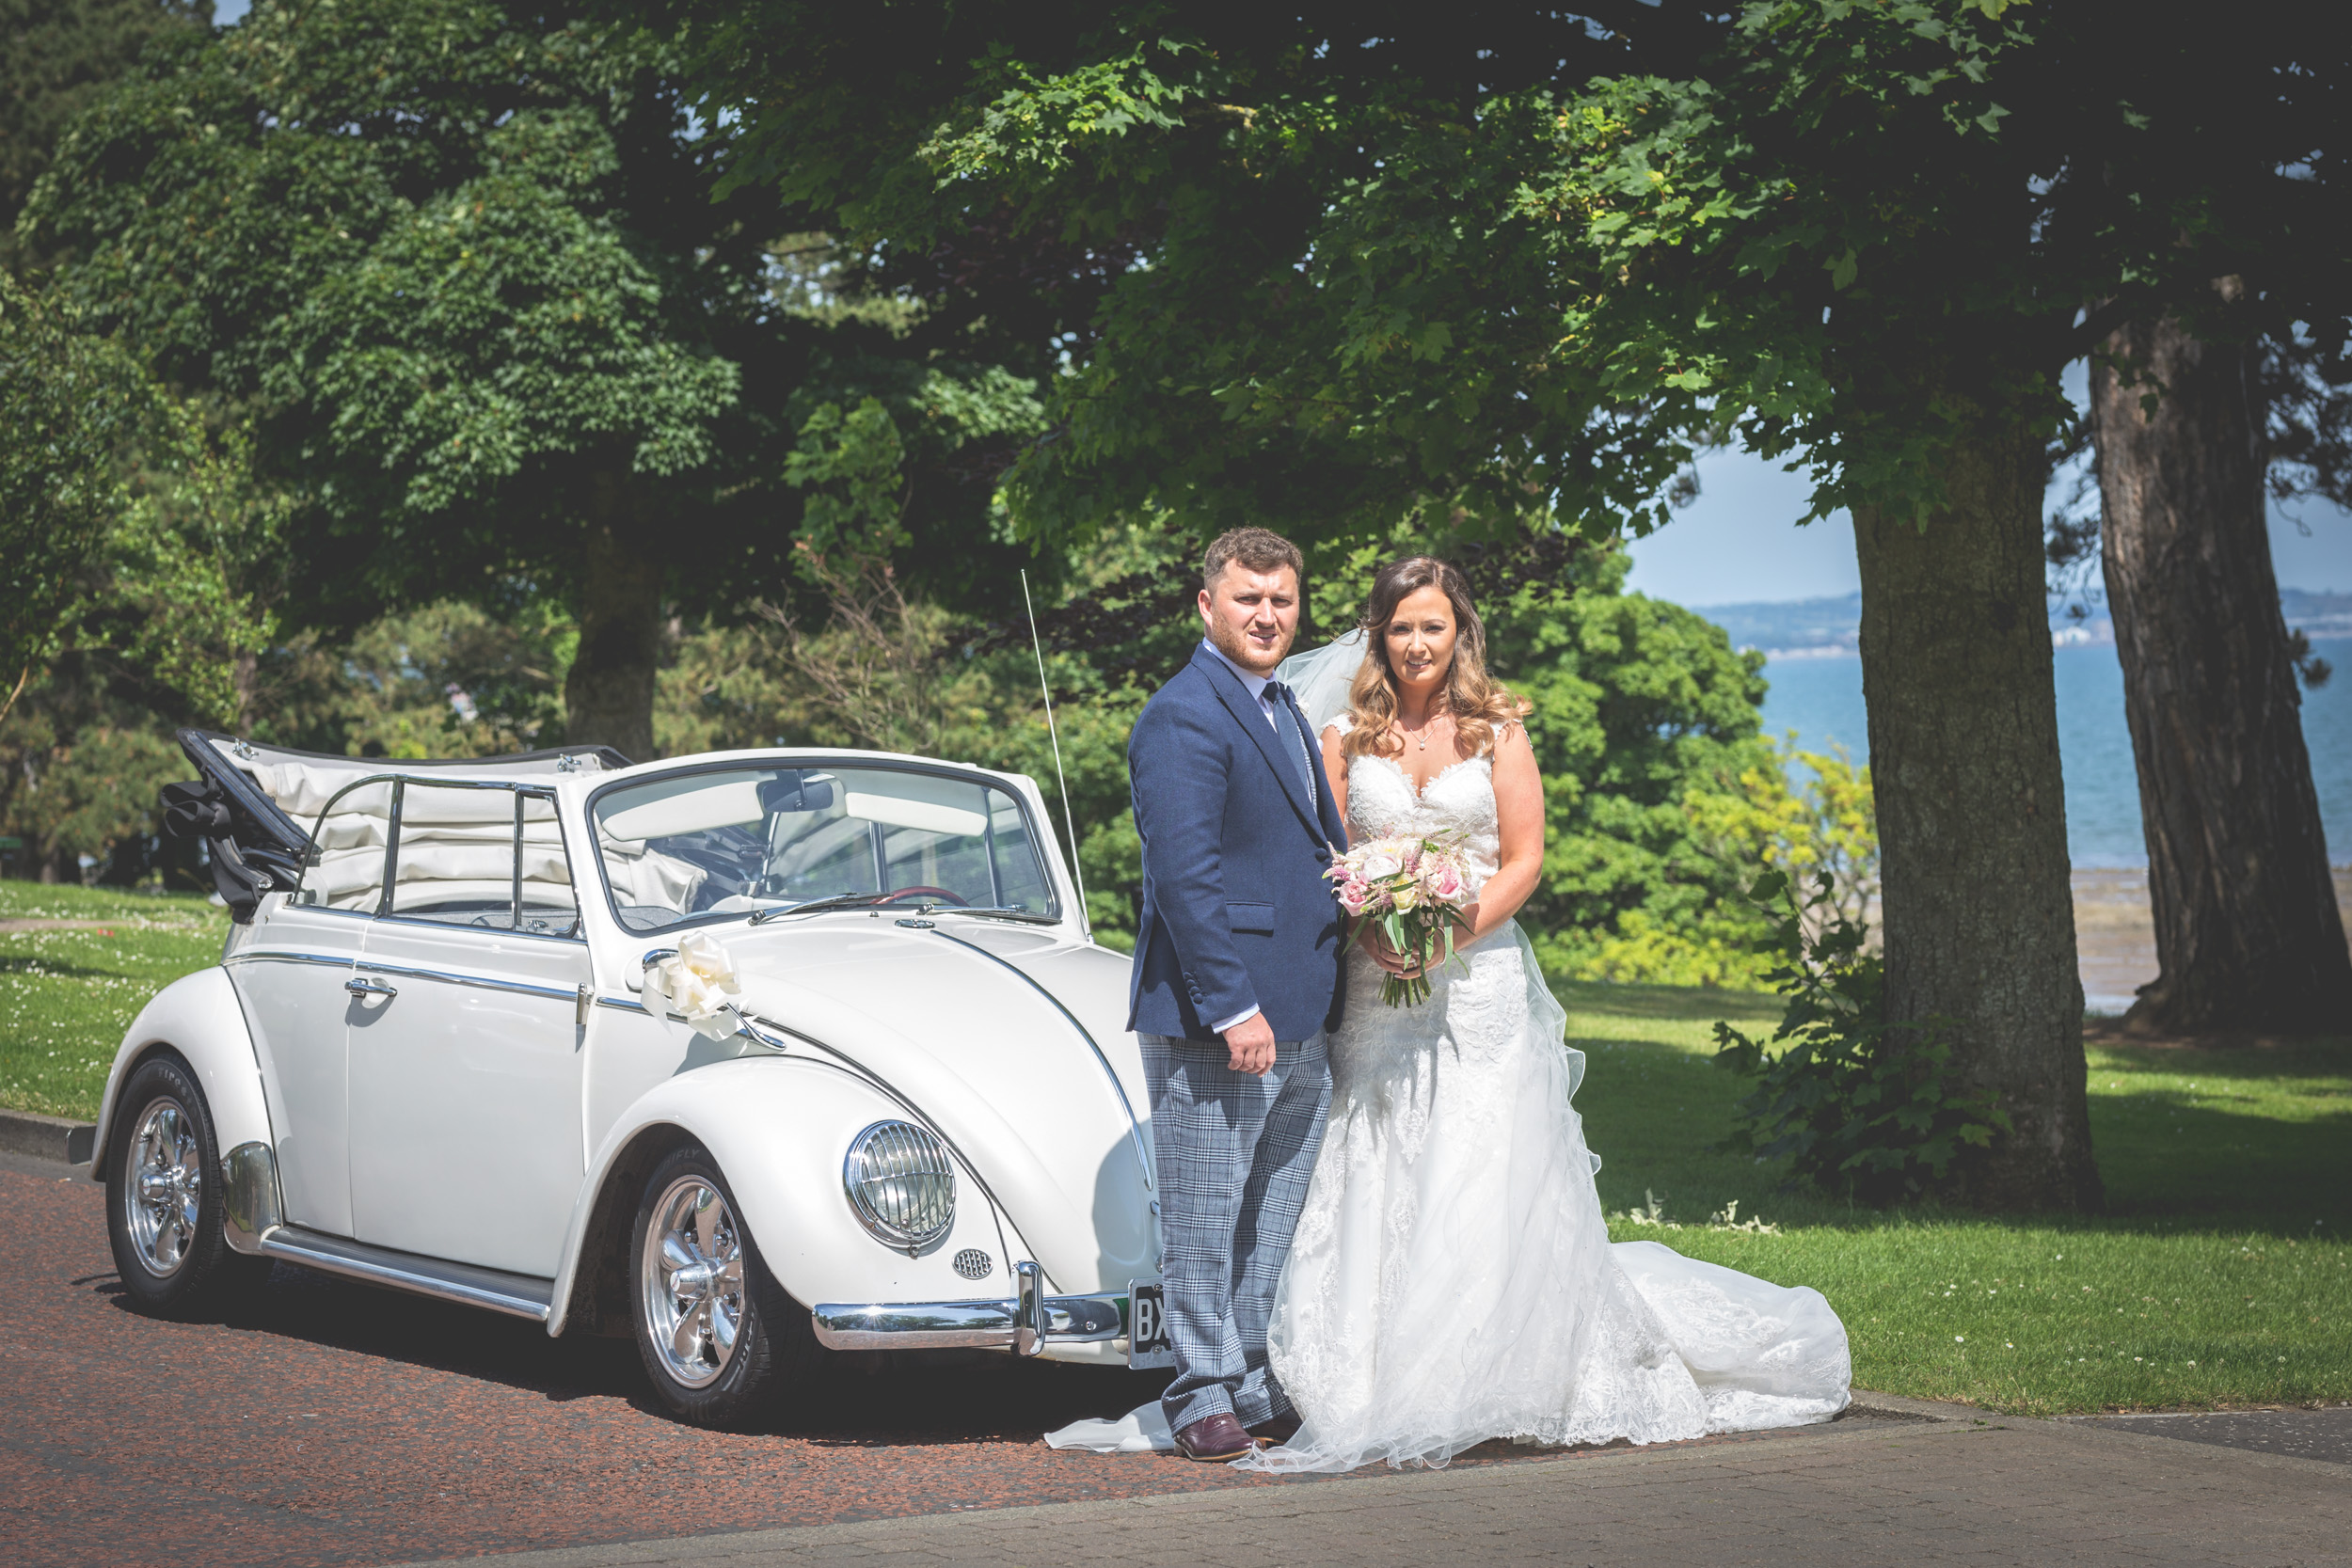 Brian McEwan   Northern Ireland Wedding Photographer   Rebecca & Michael   Portraits-10.jpg